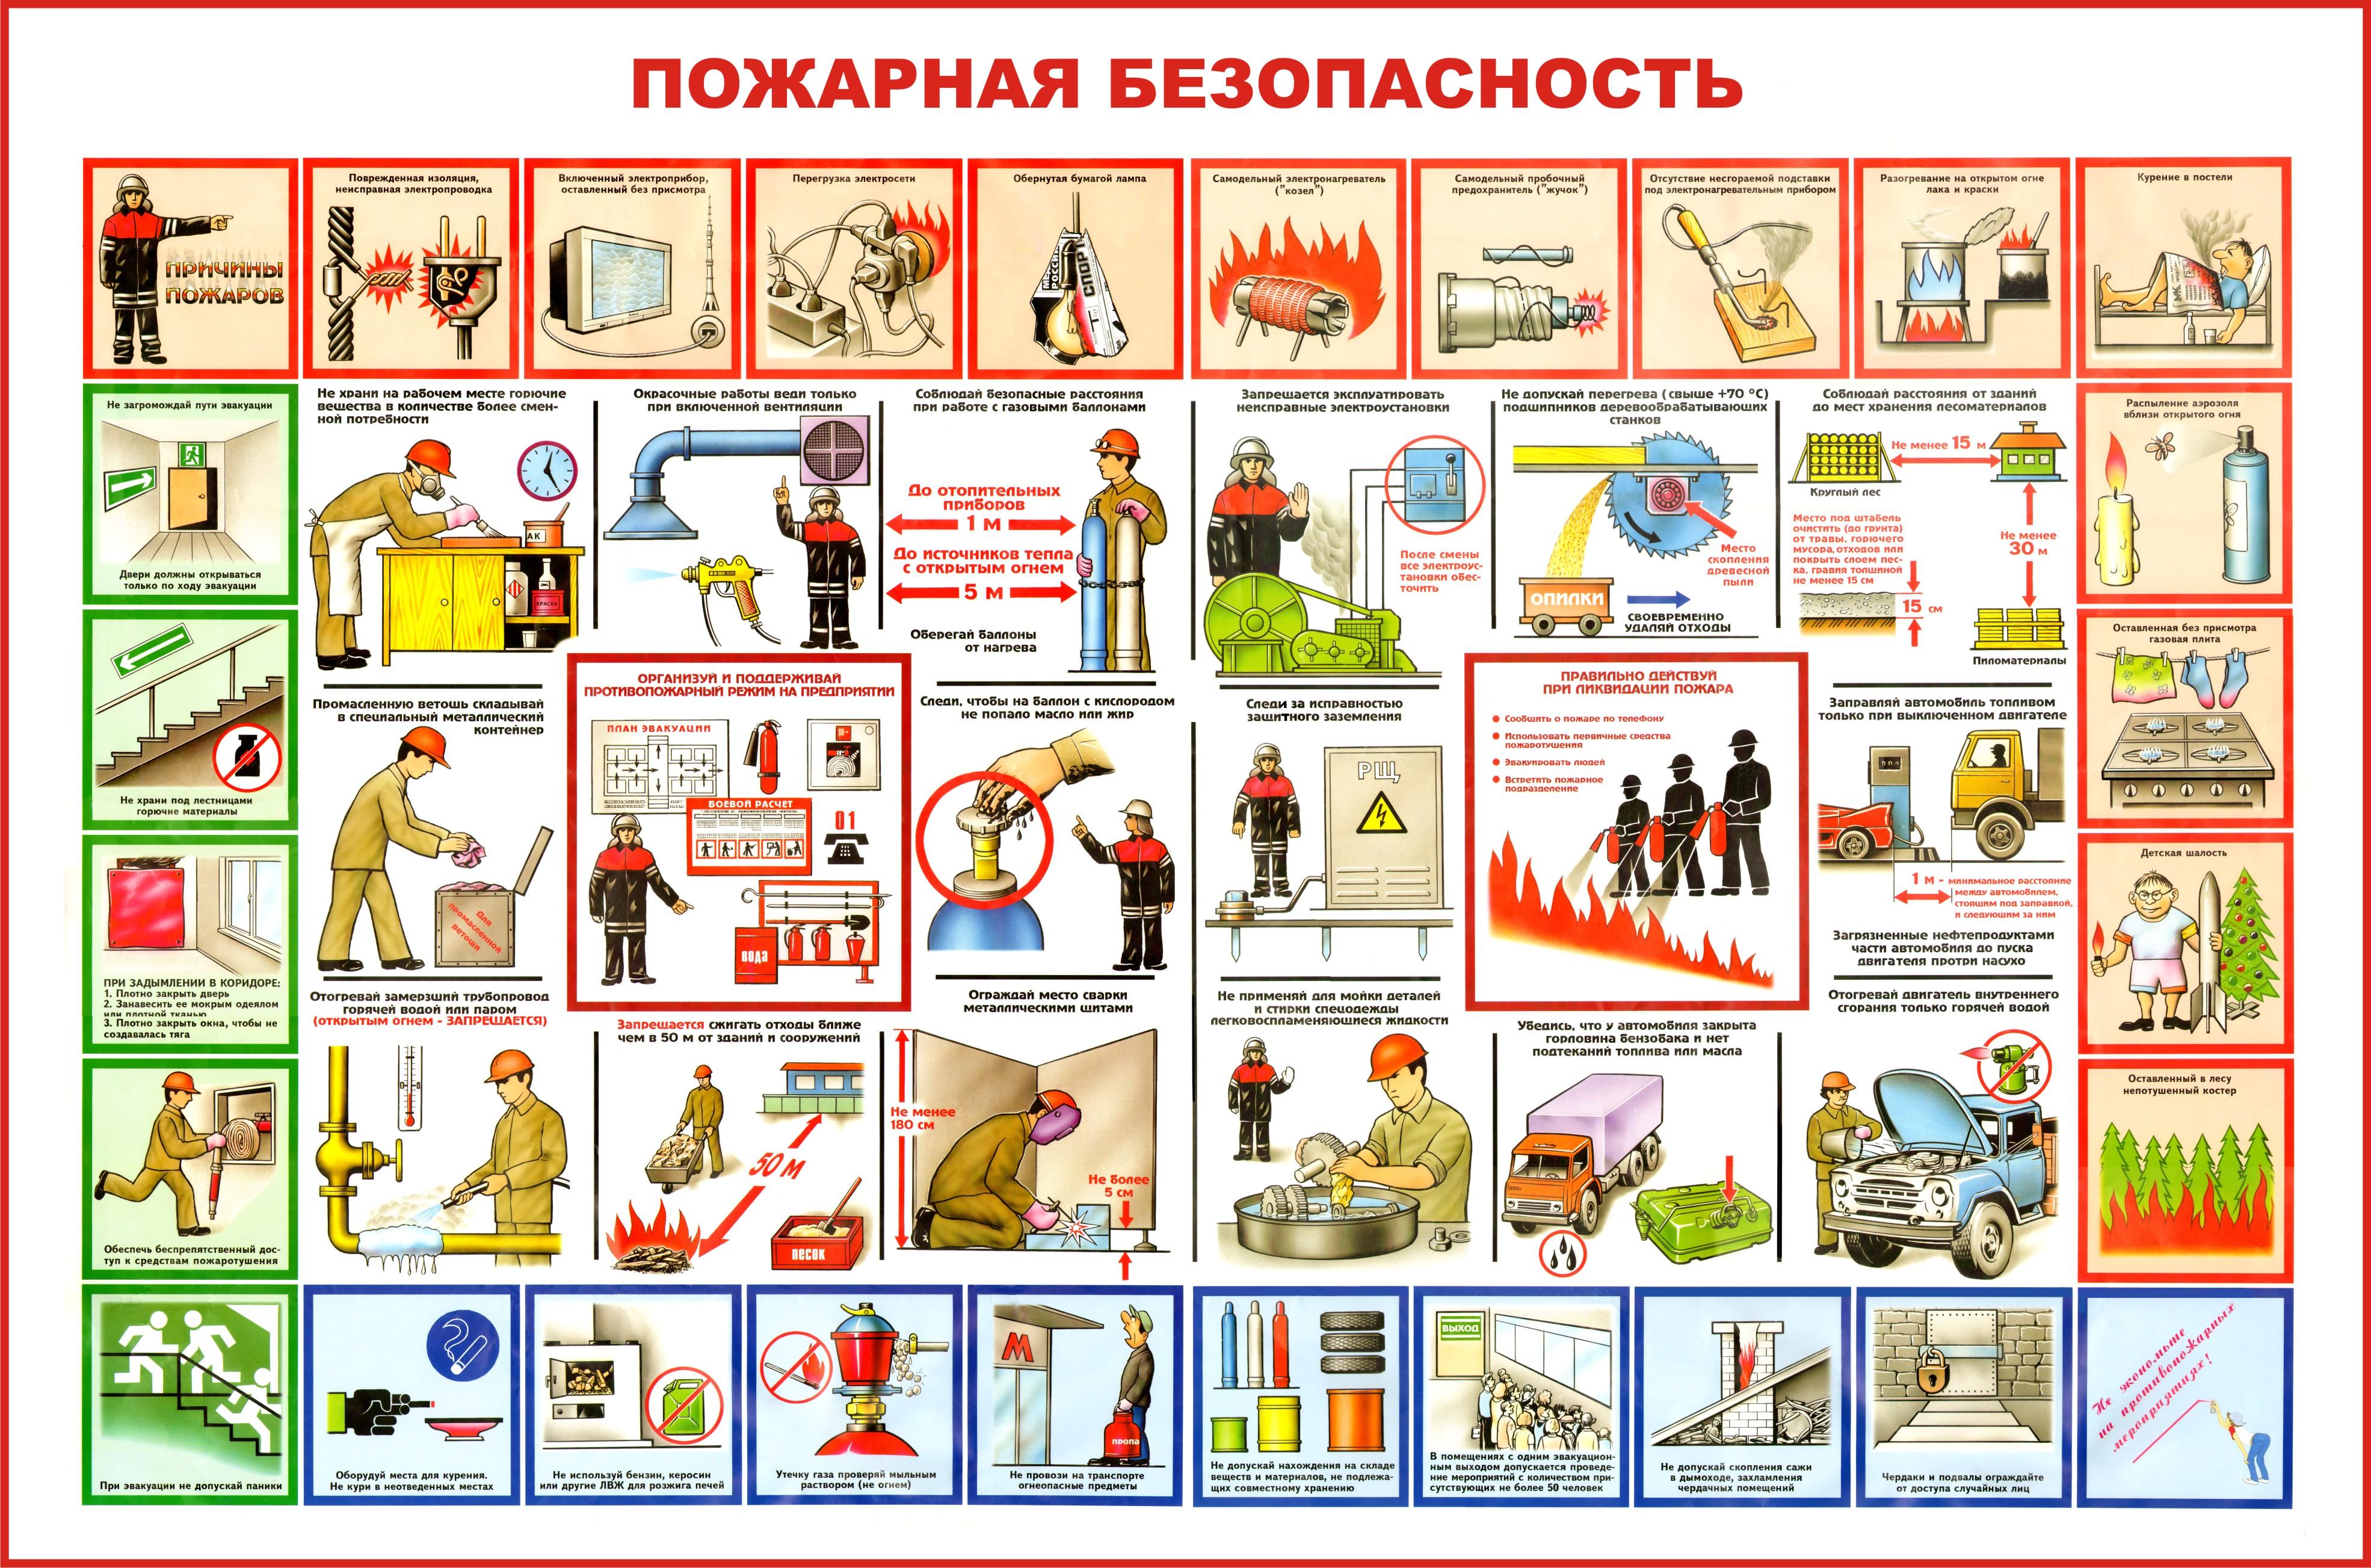 Сотрудники МЧС провели проверку «Нафтана»